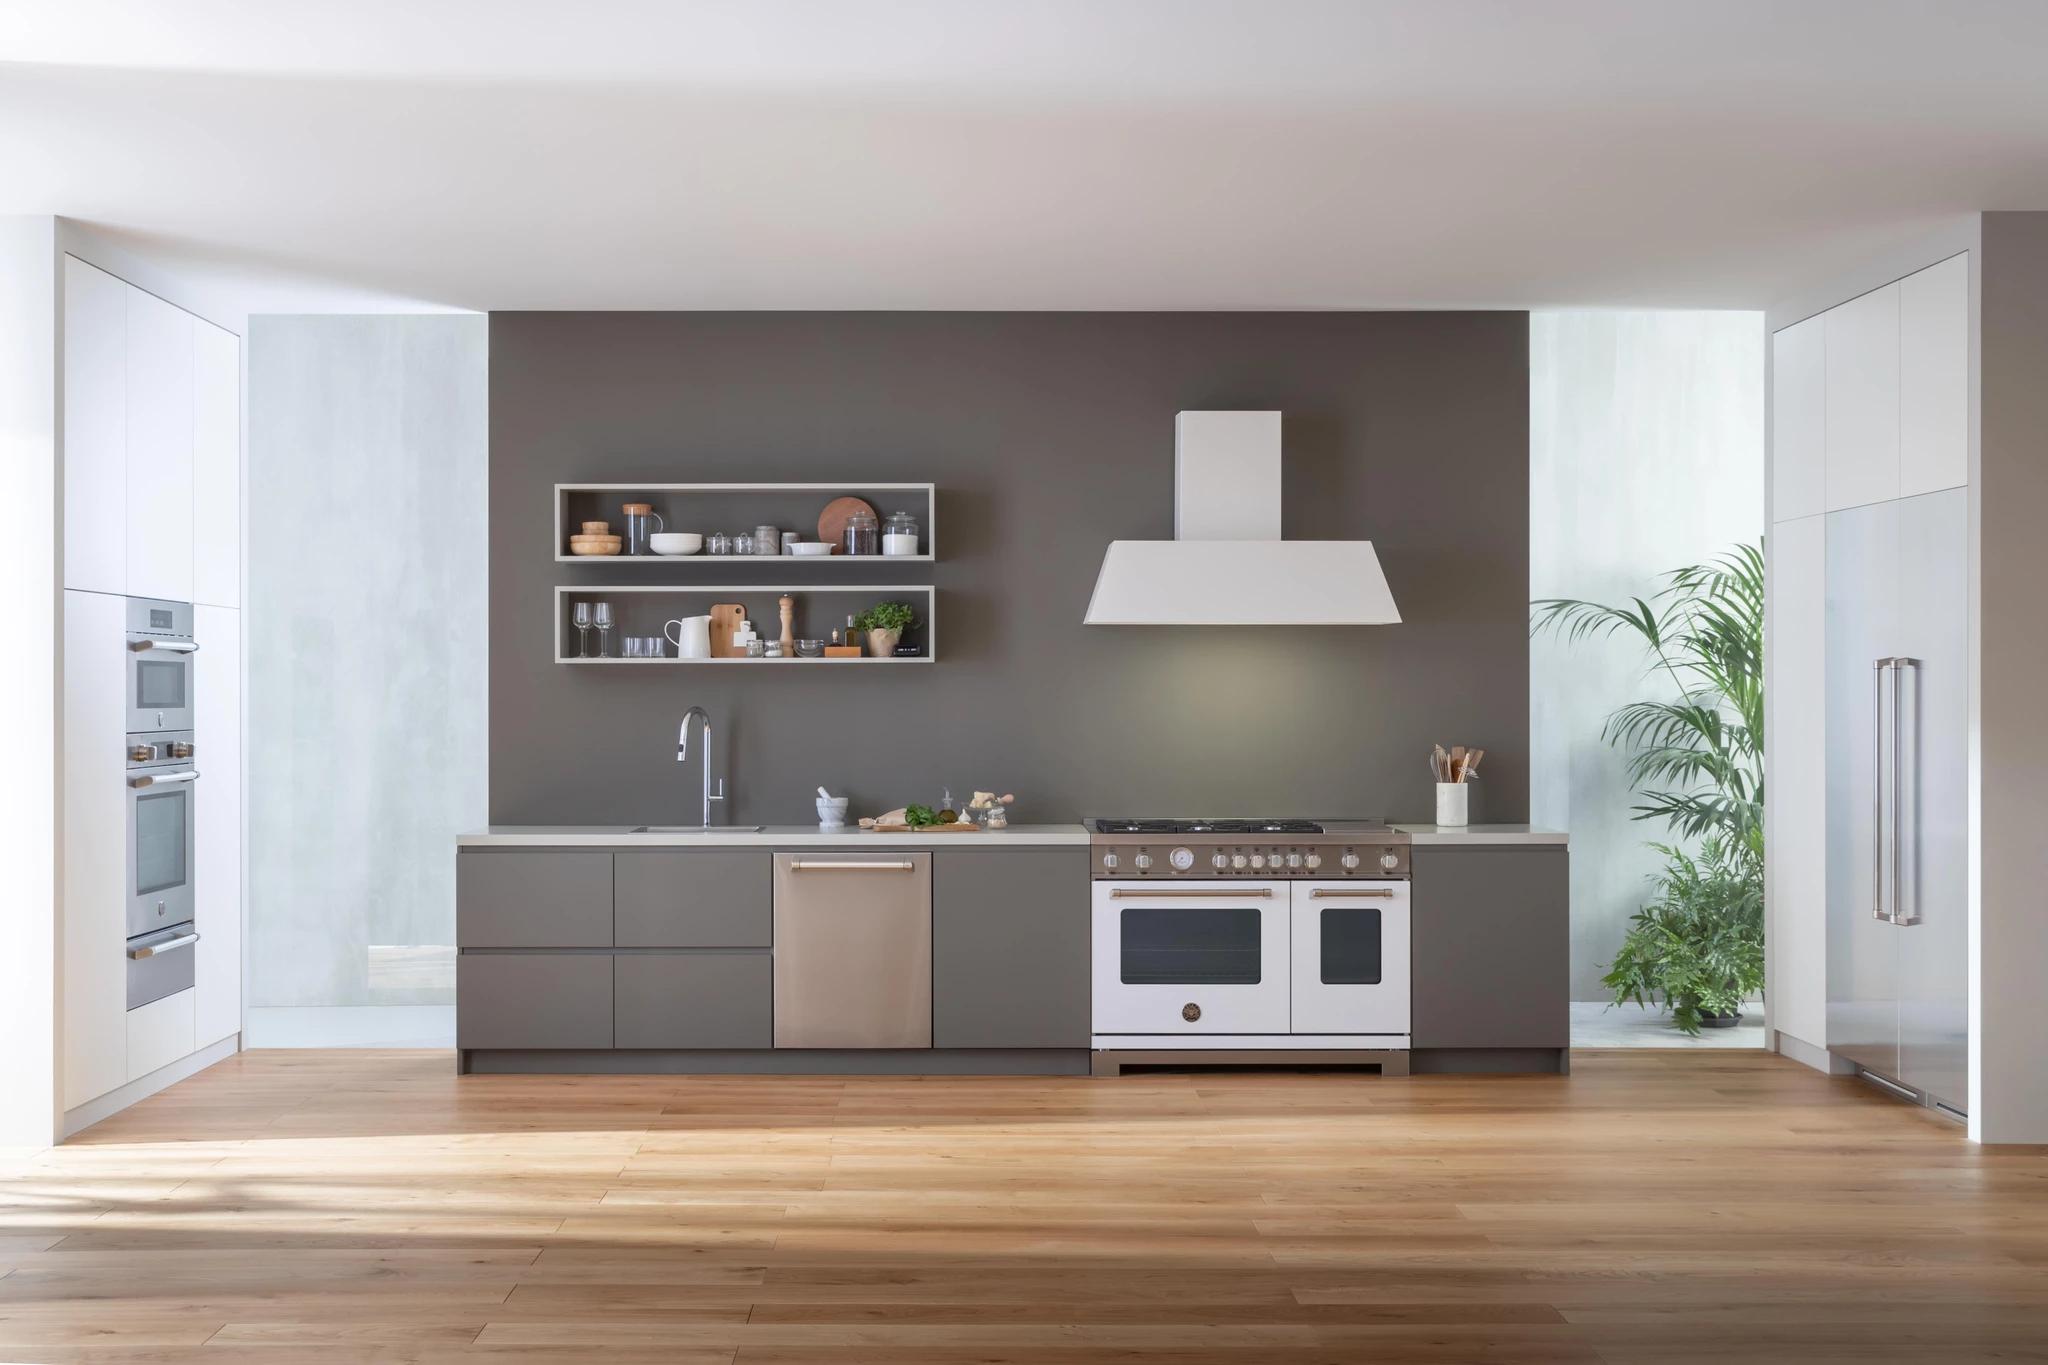 Bertazzoni - Up to 3 Free Appliances